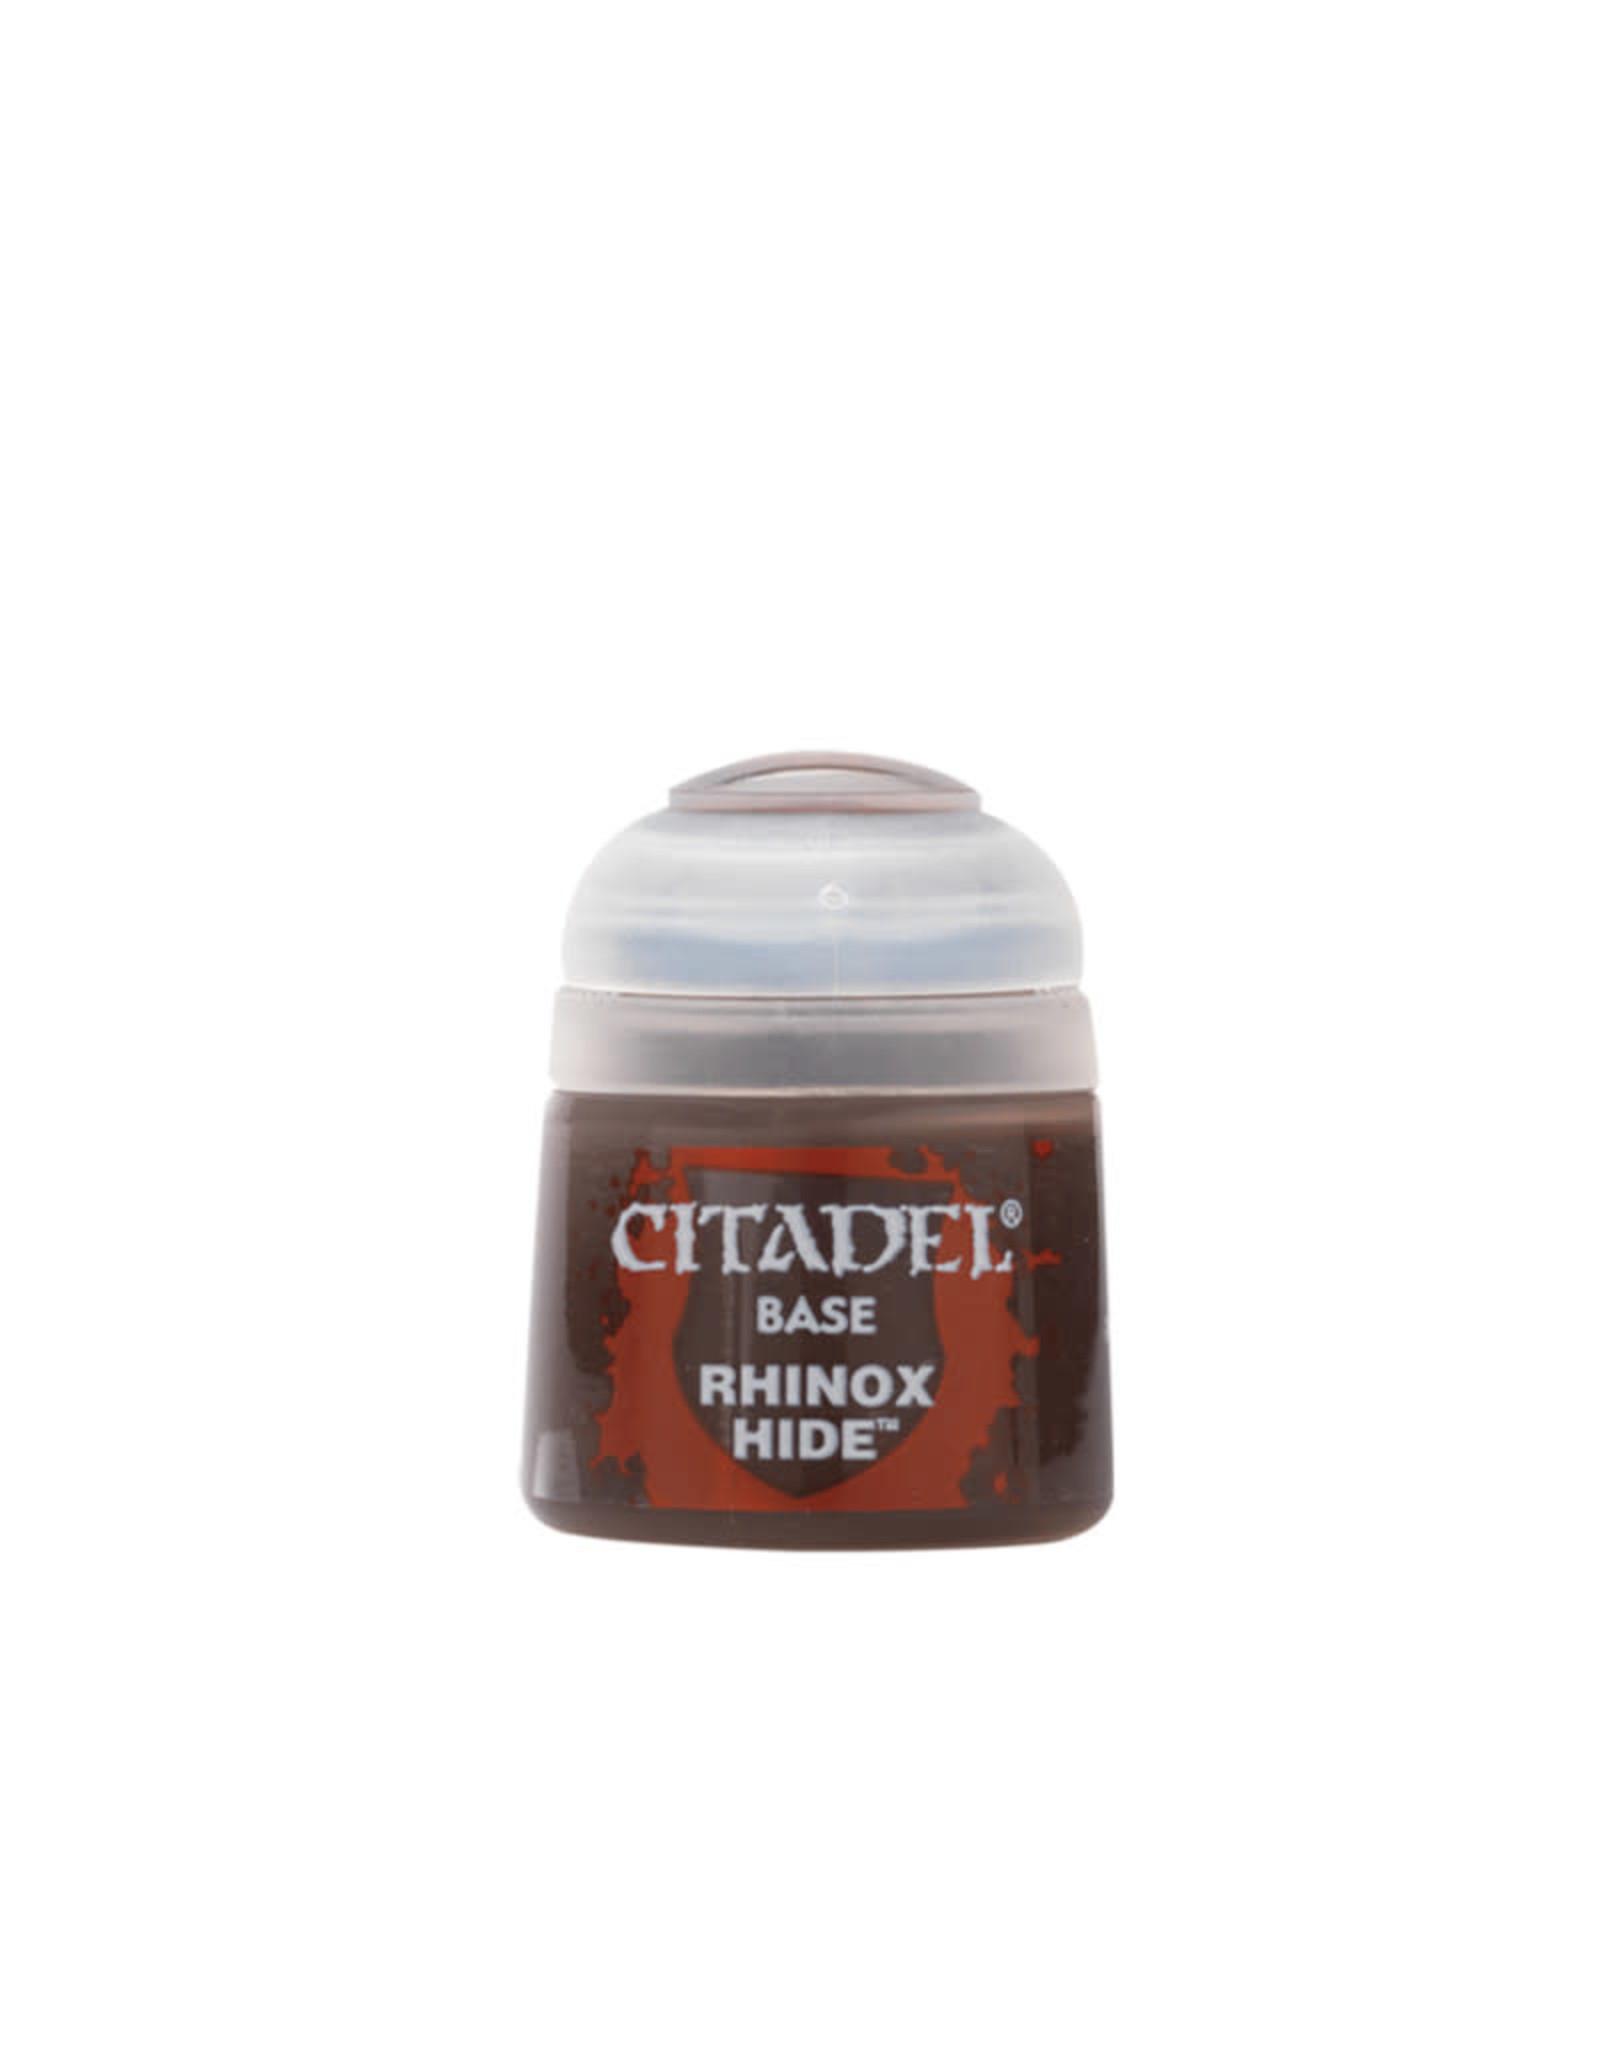 Citadel Base Paint: Rhinox Hide